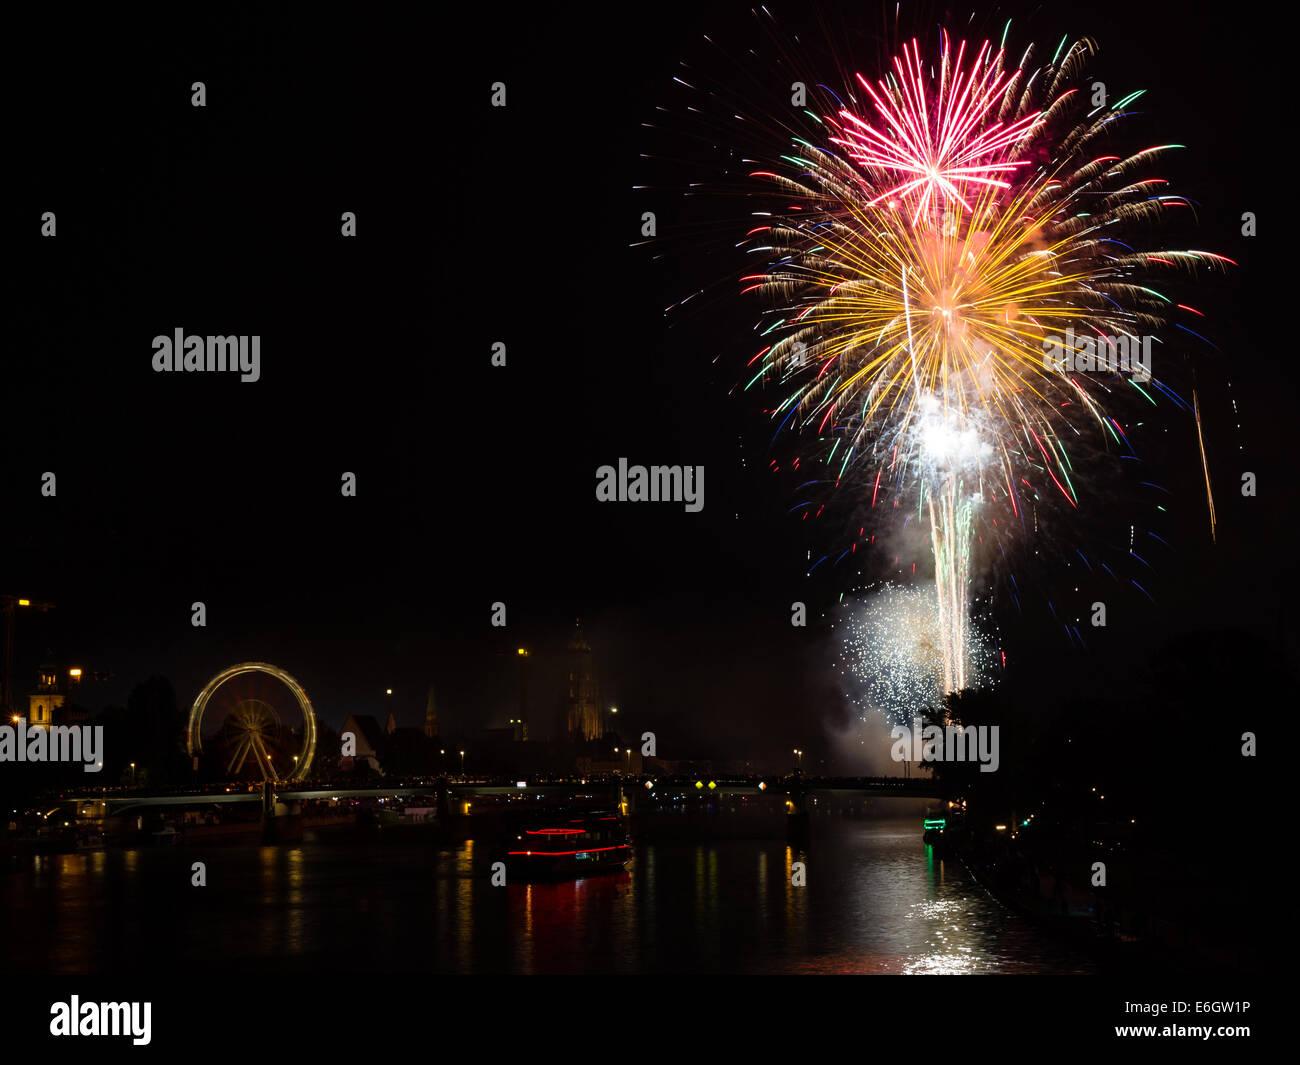 Firework over Frankfurt am Main, Hessen, Germany - Stock Image